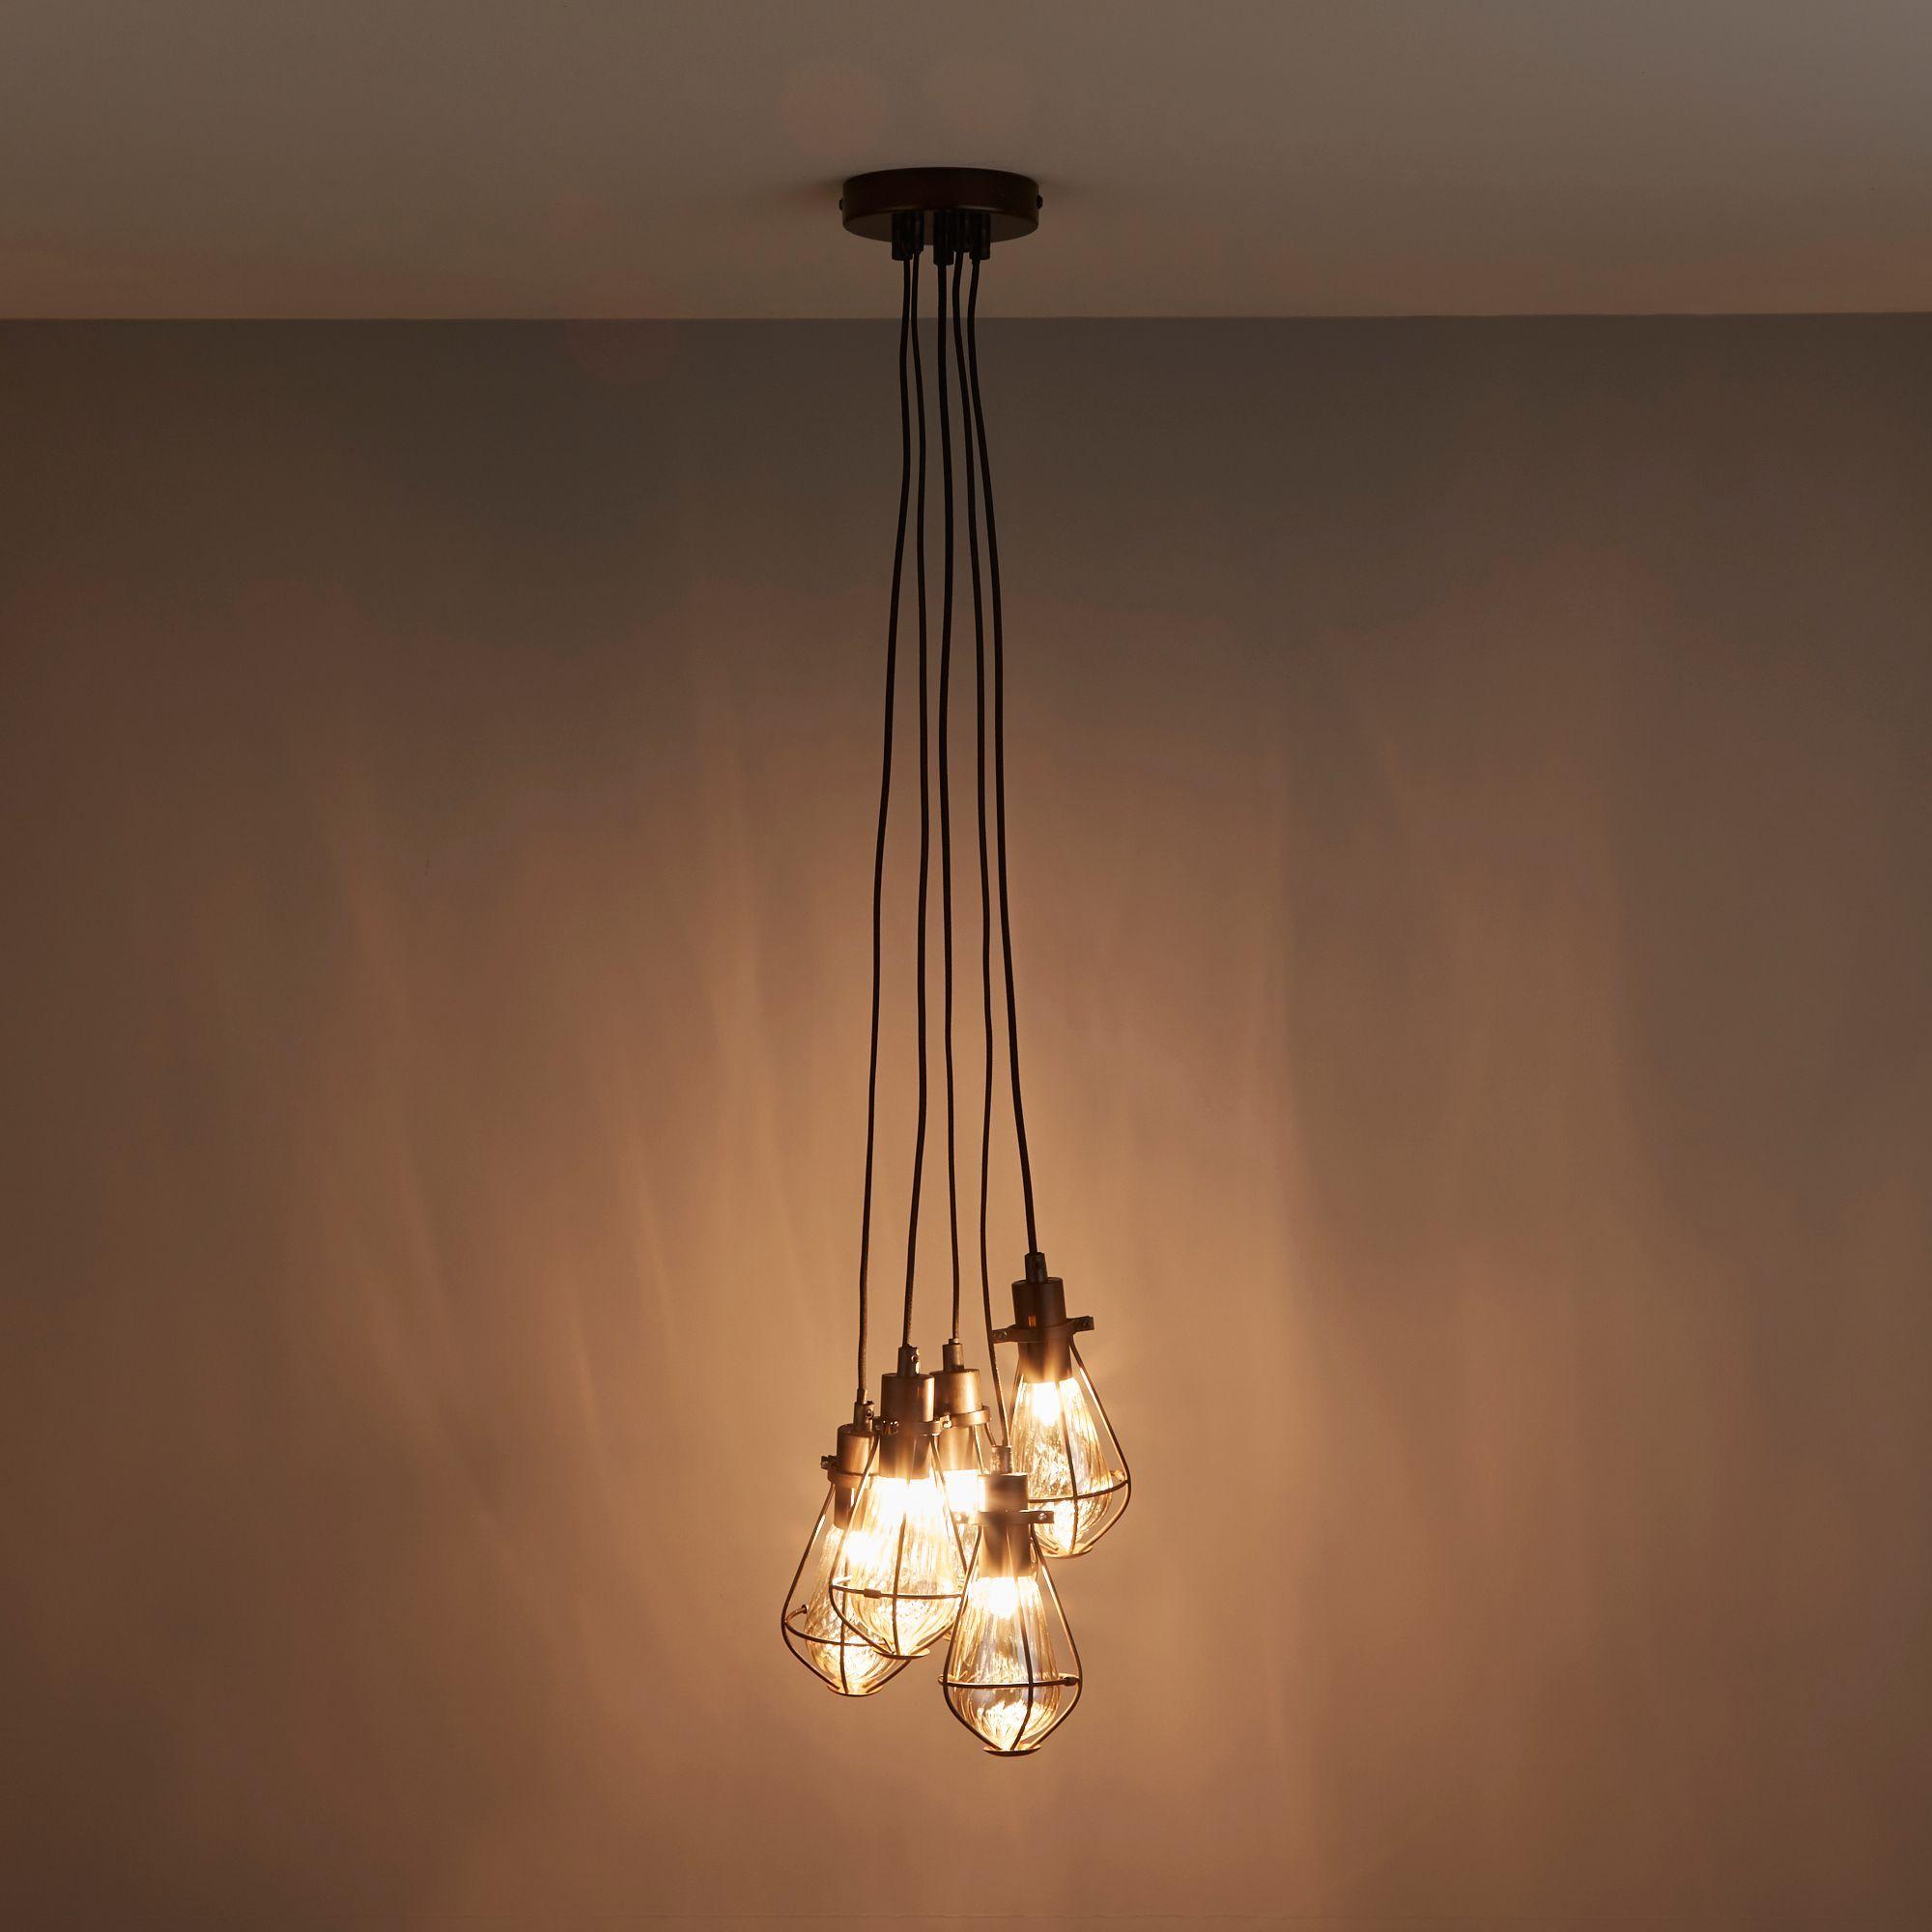 Bronze Effect 5 Lamp Ceiling Light